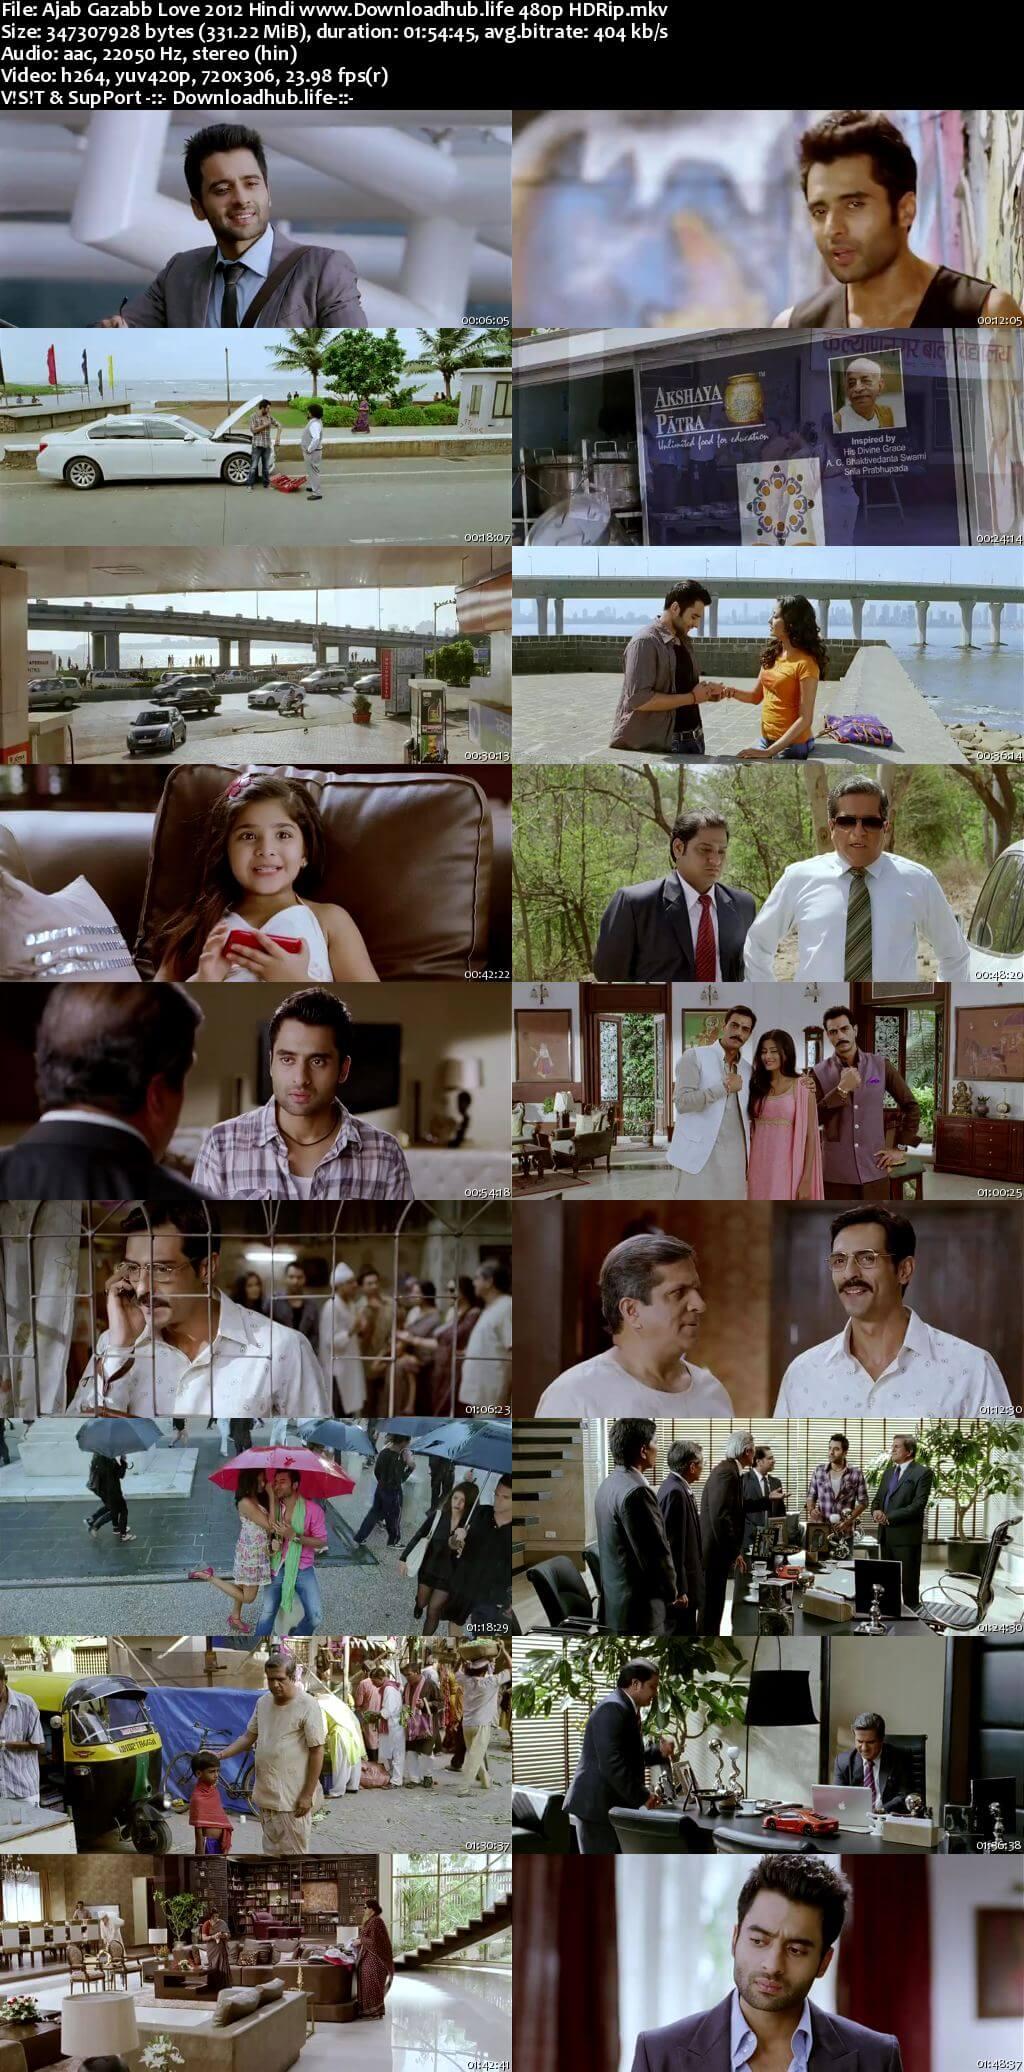 Ajab Gazabb Love 2012 Hindi 300MB HDRip 480p